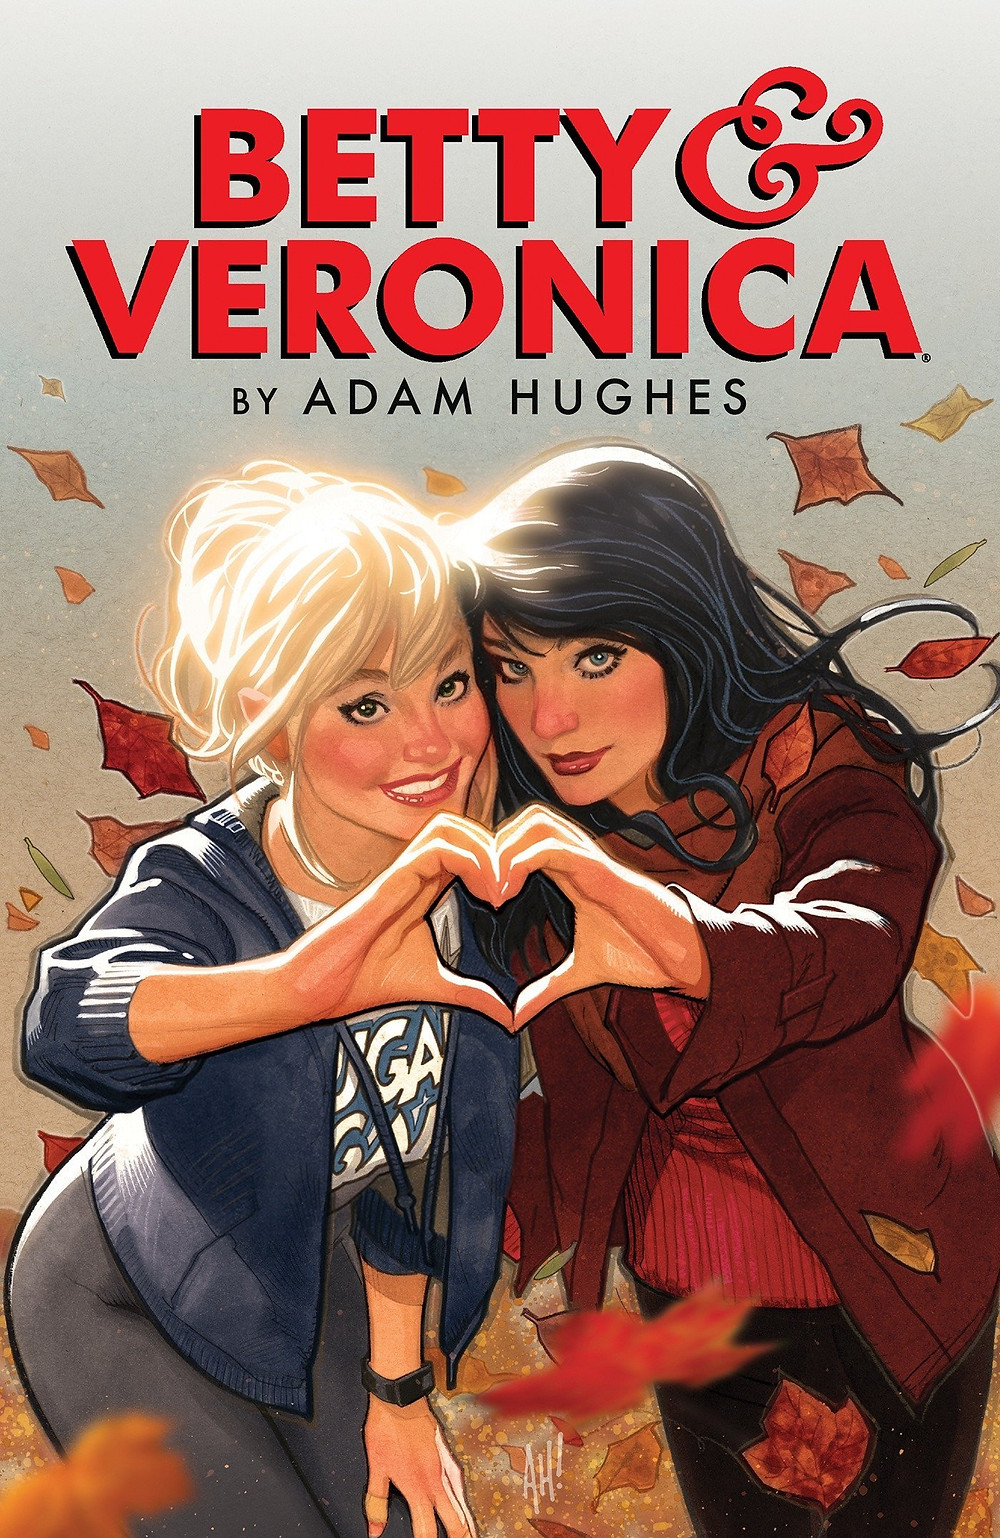 Betty & Veronica, Vol. 1 (tpb), cover, Archie Comics, Hughes